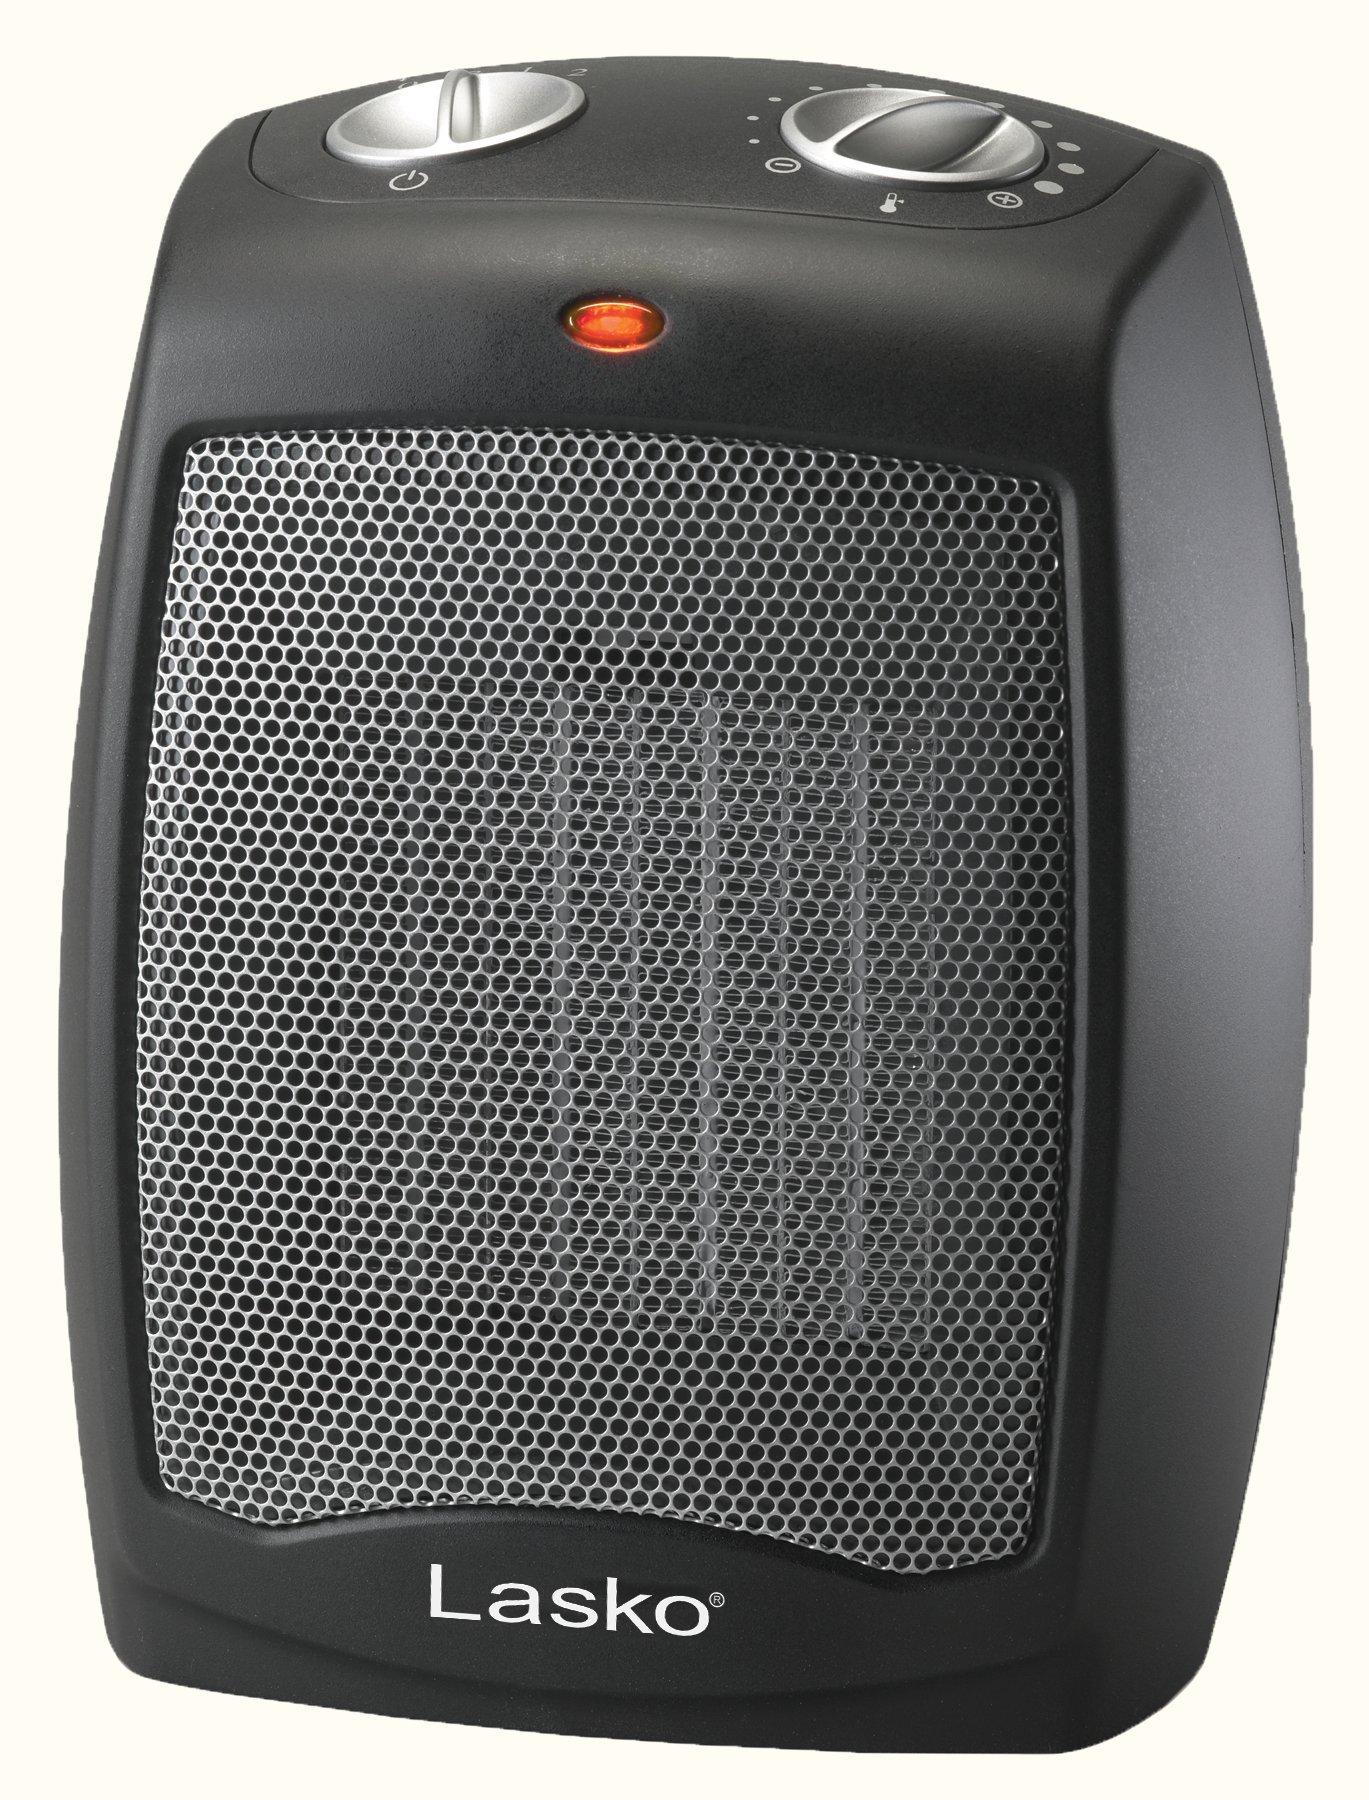 Lasko CD09250 Ceramic Heater with Adjustable Thermostat Tabletop Or Under-Desk, Black by Lasko